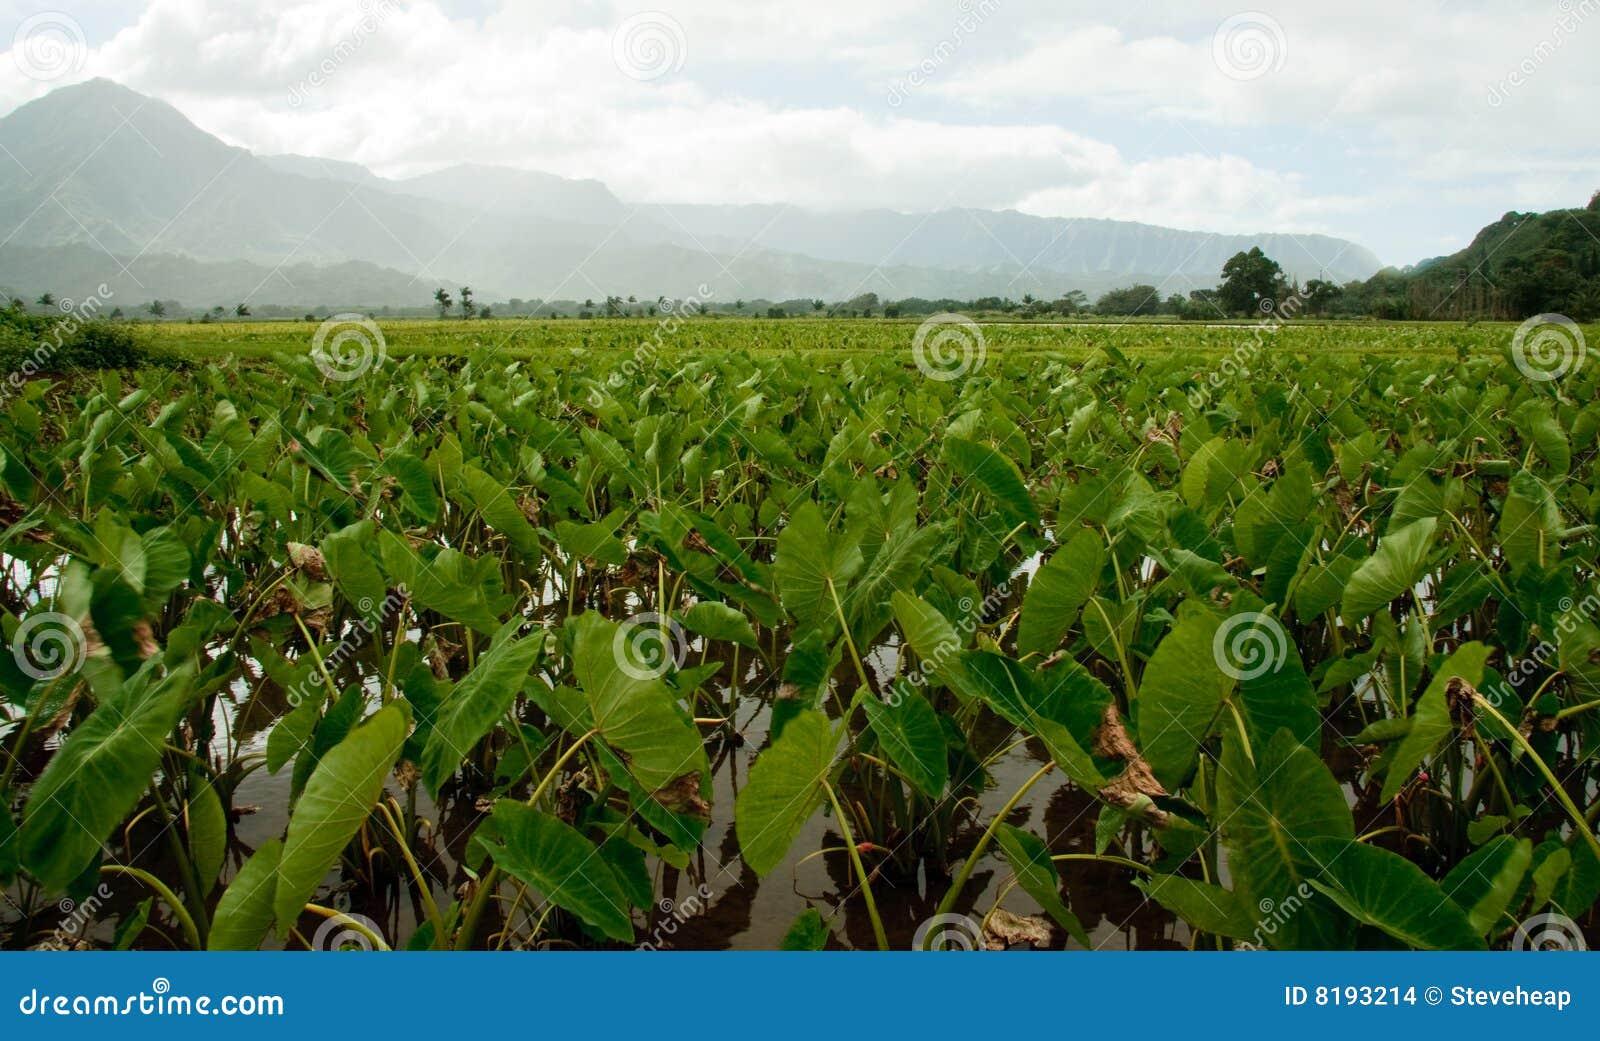 Taro plants in Hanalei valley